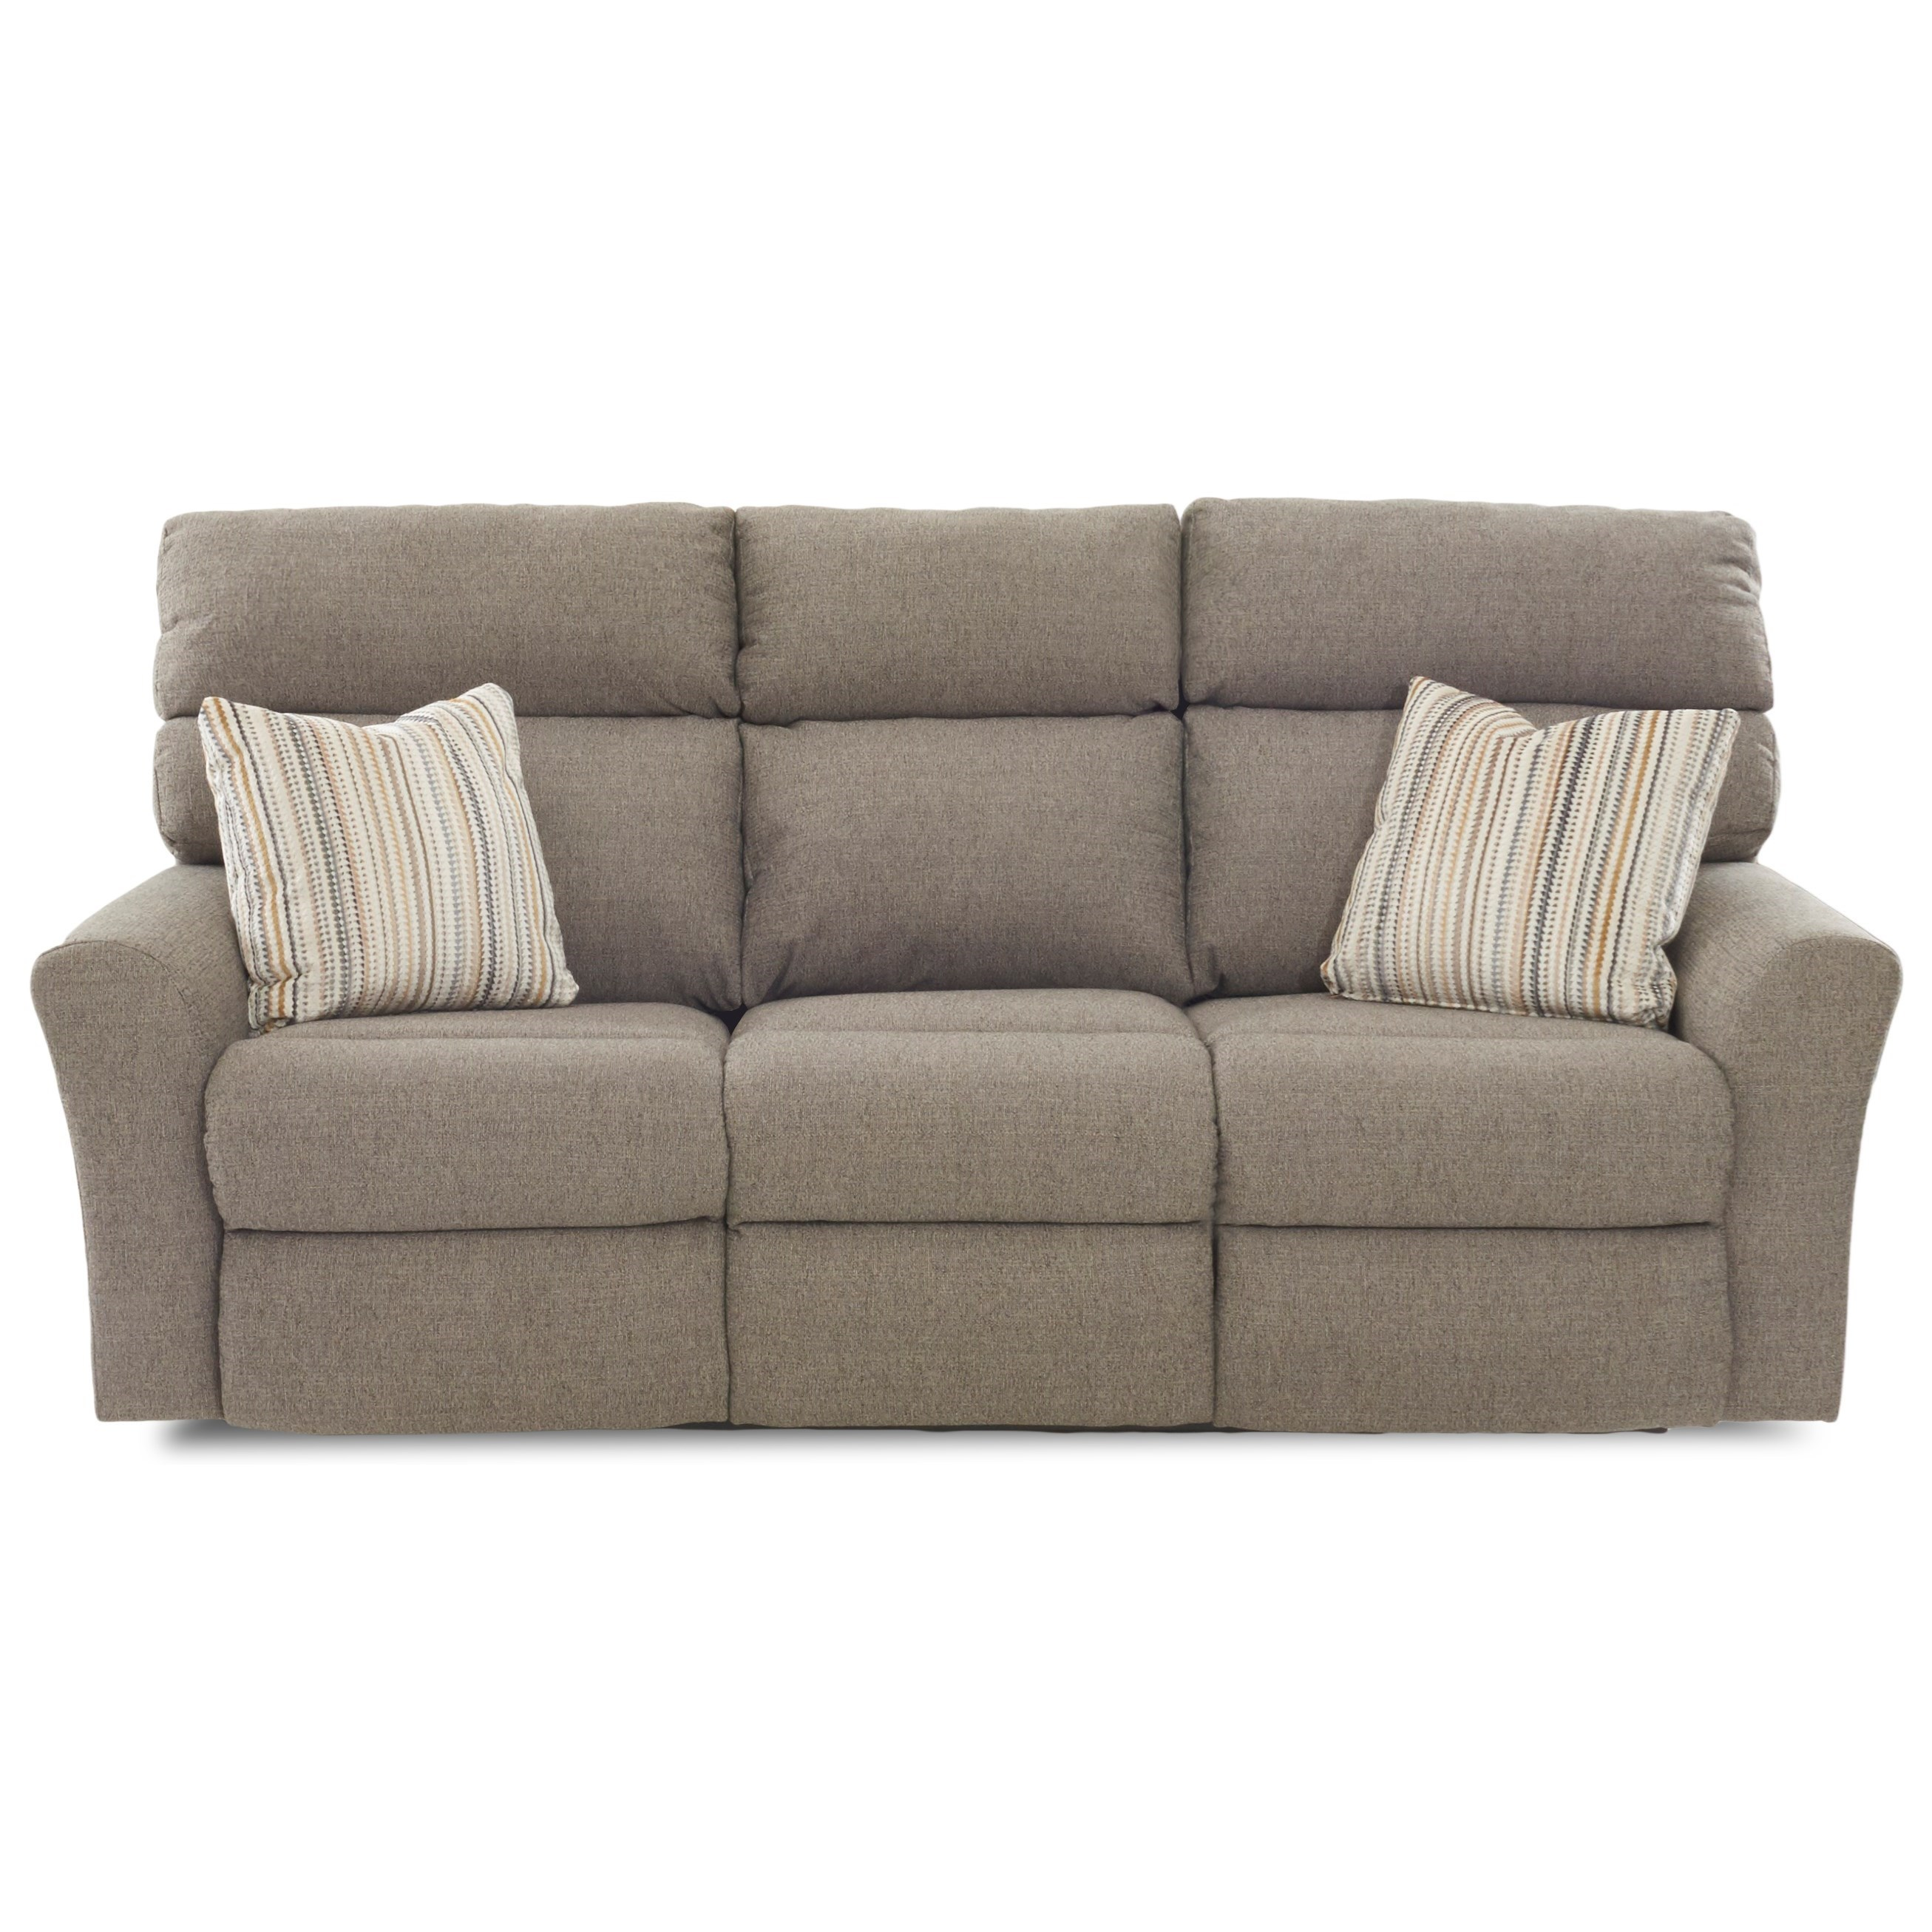 klaussner grand power reclining sofa pier 1 sofas reviews xavier 48403p pw3rs casual three recliner